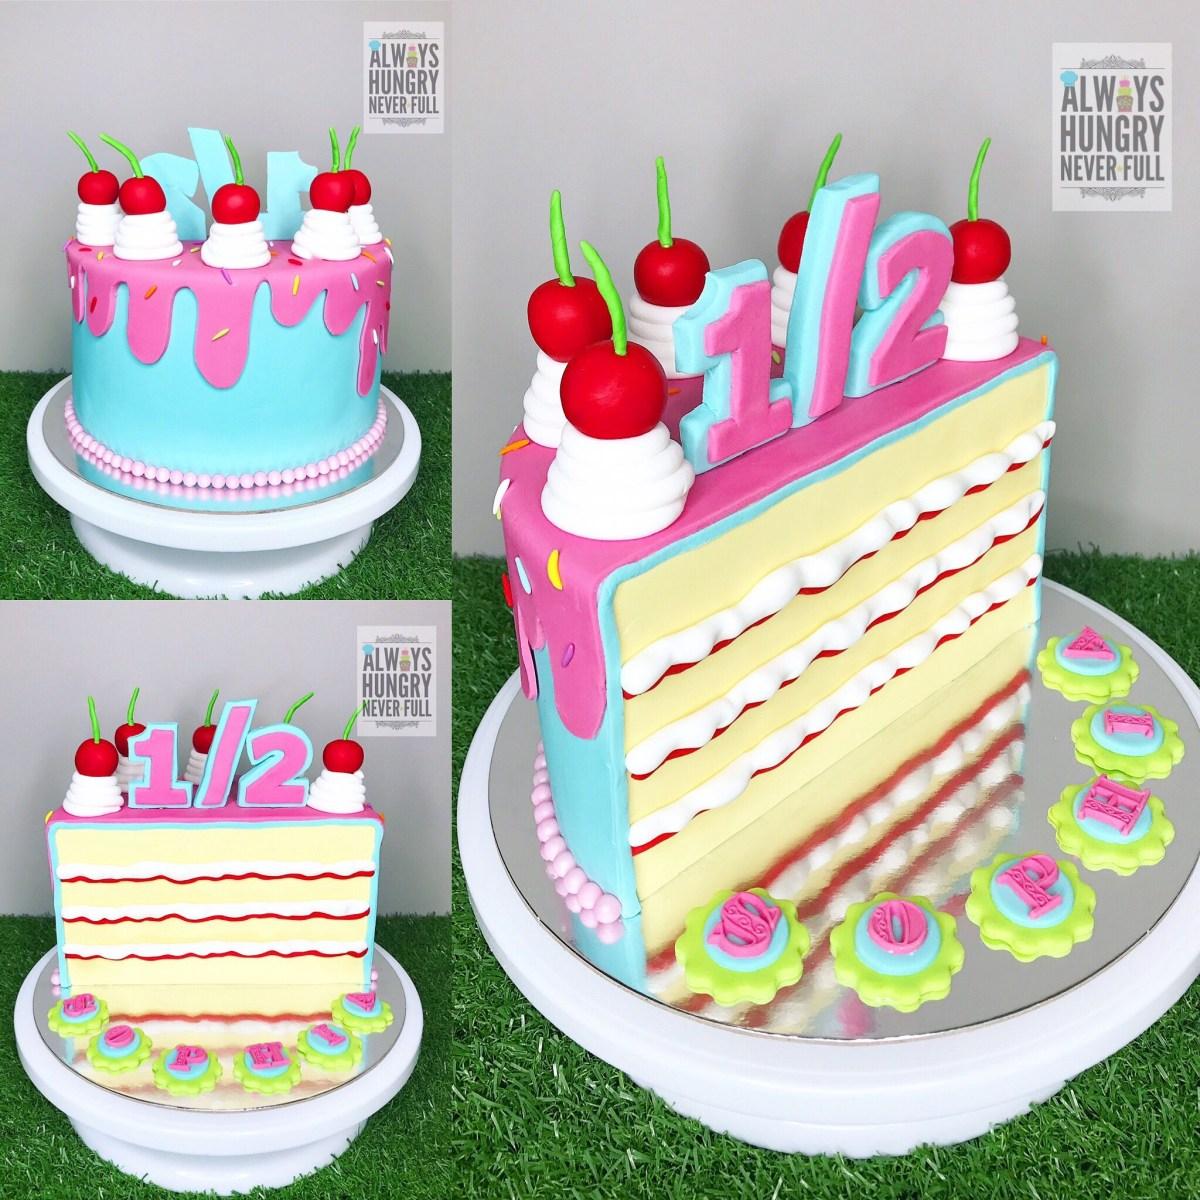 6 Month Birthday Cake Half Cake For 6th Month Birthday Bebe Pinterest Half Birthday